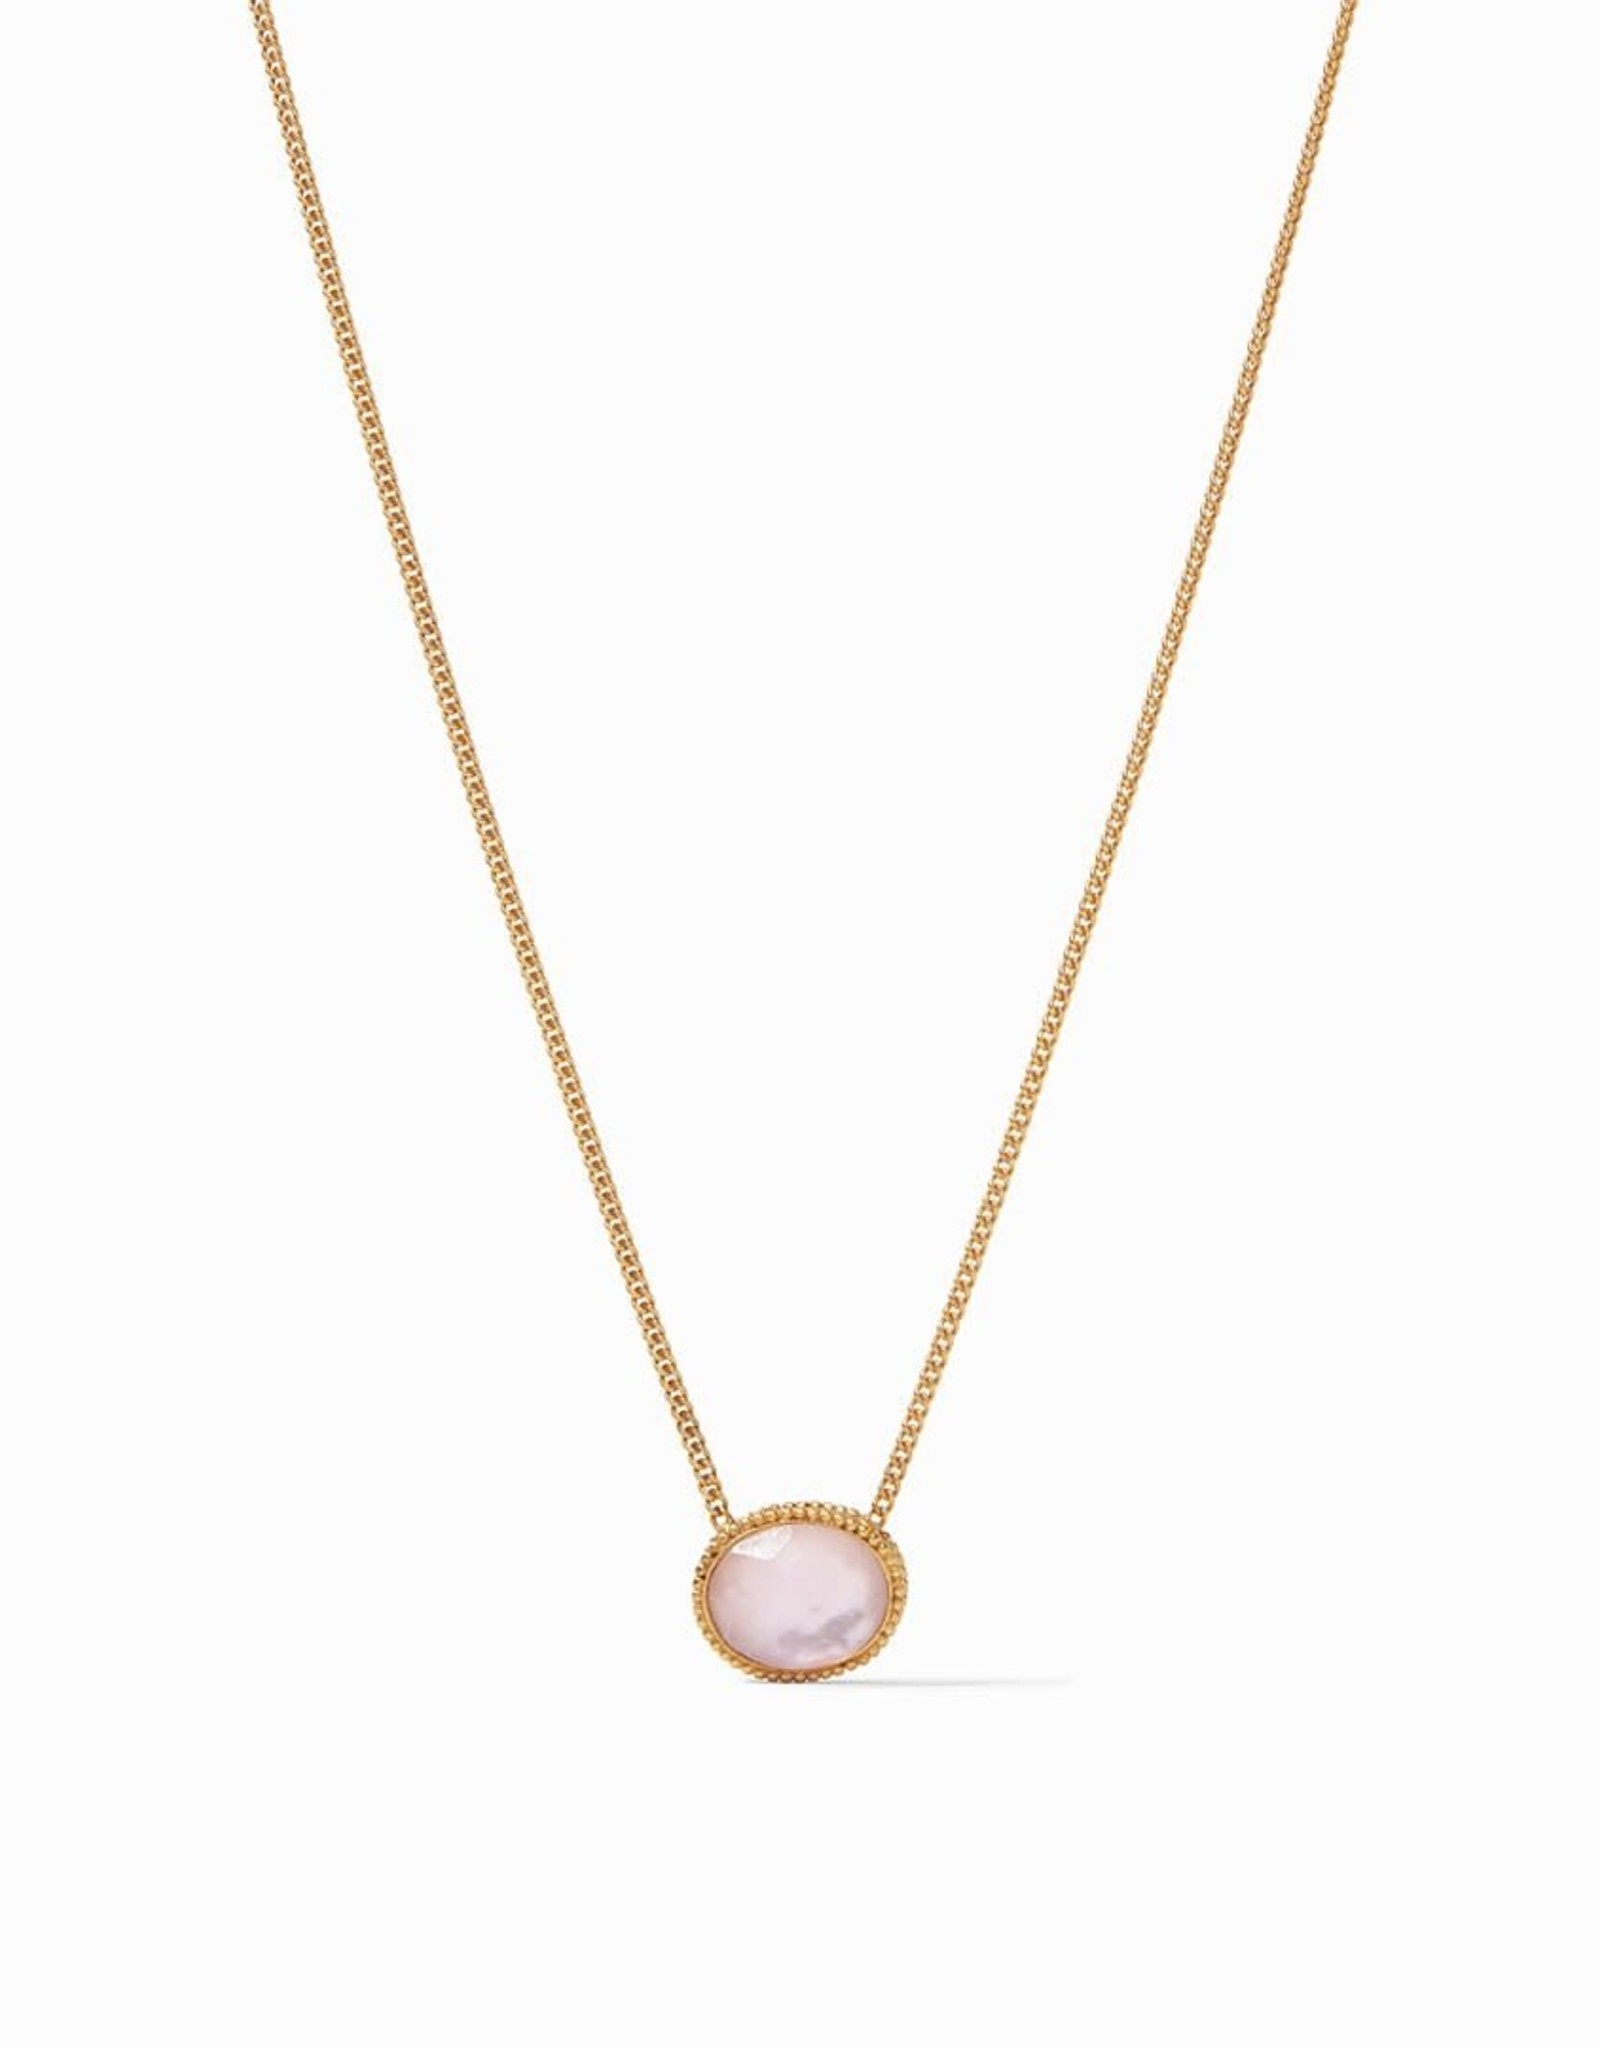 Julie Vos Julie Vos Verona Solitaire Necklace Iridescent Rose